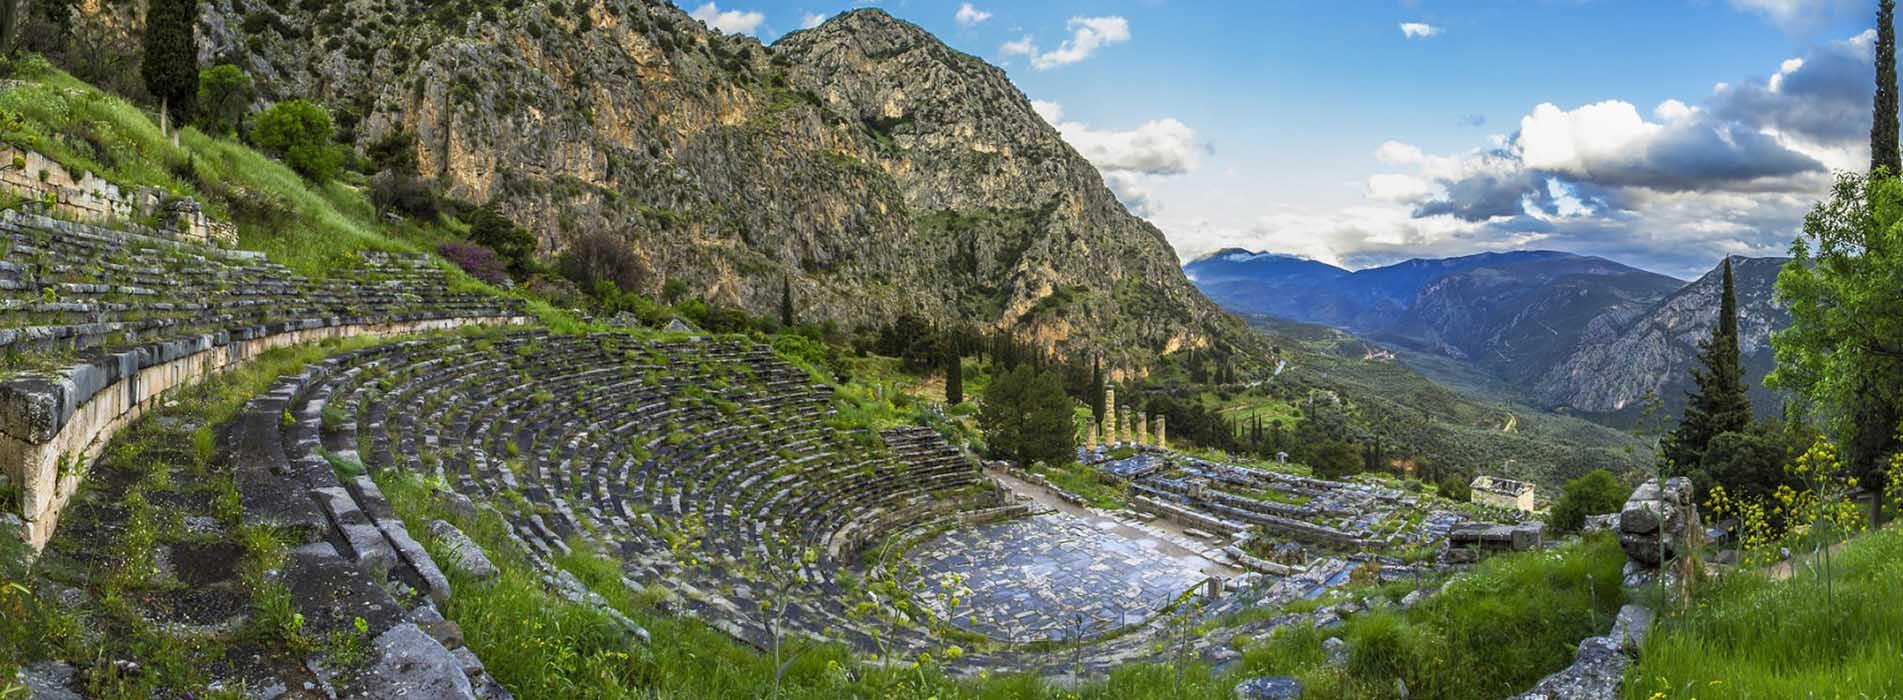 Greece - Delphi 2 (main)